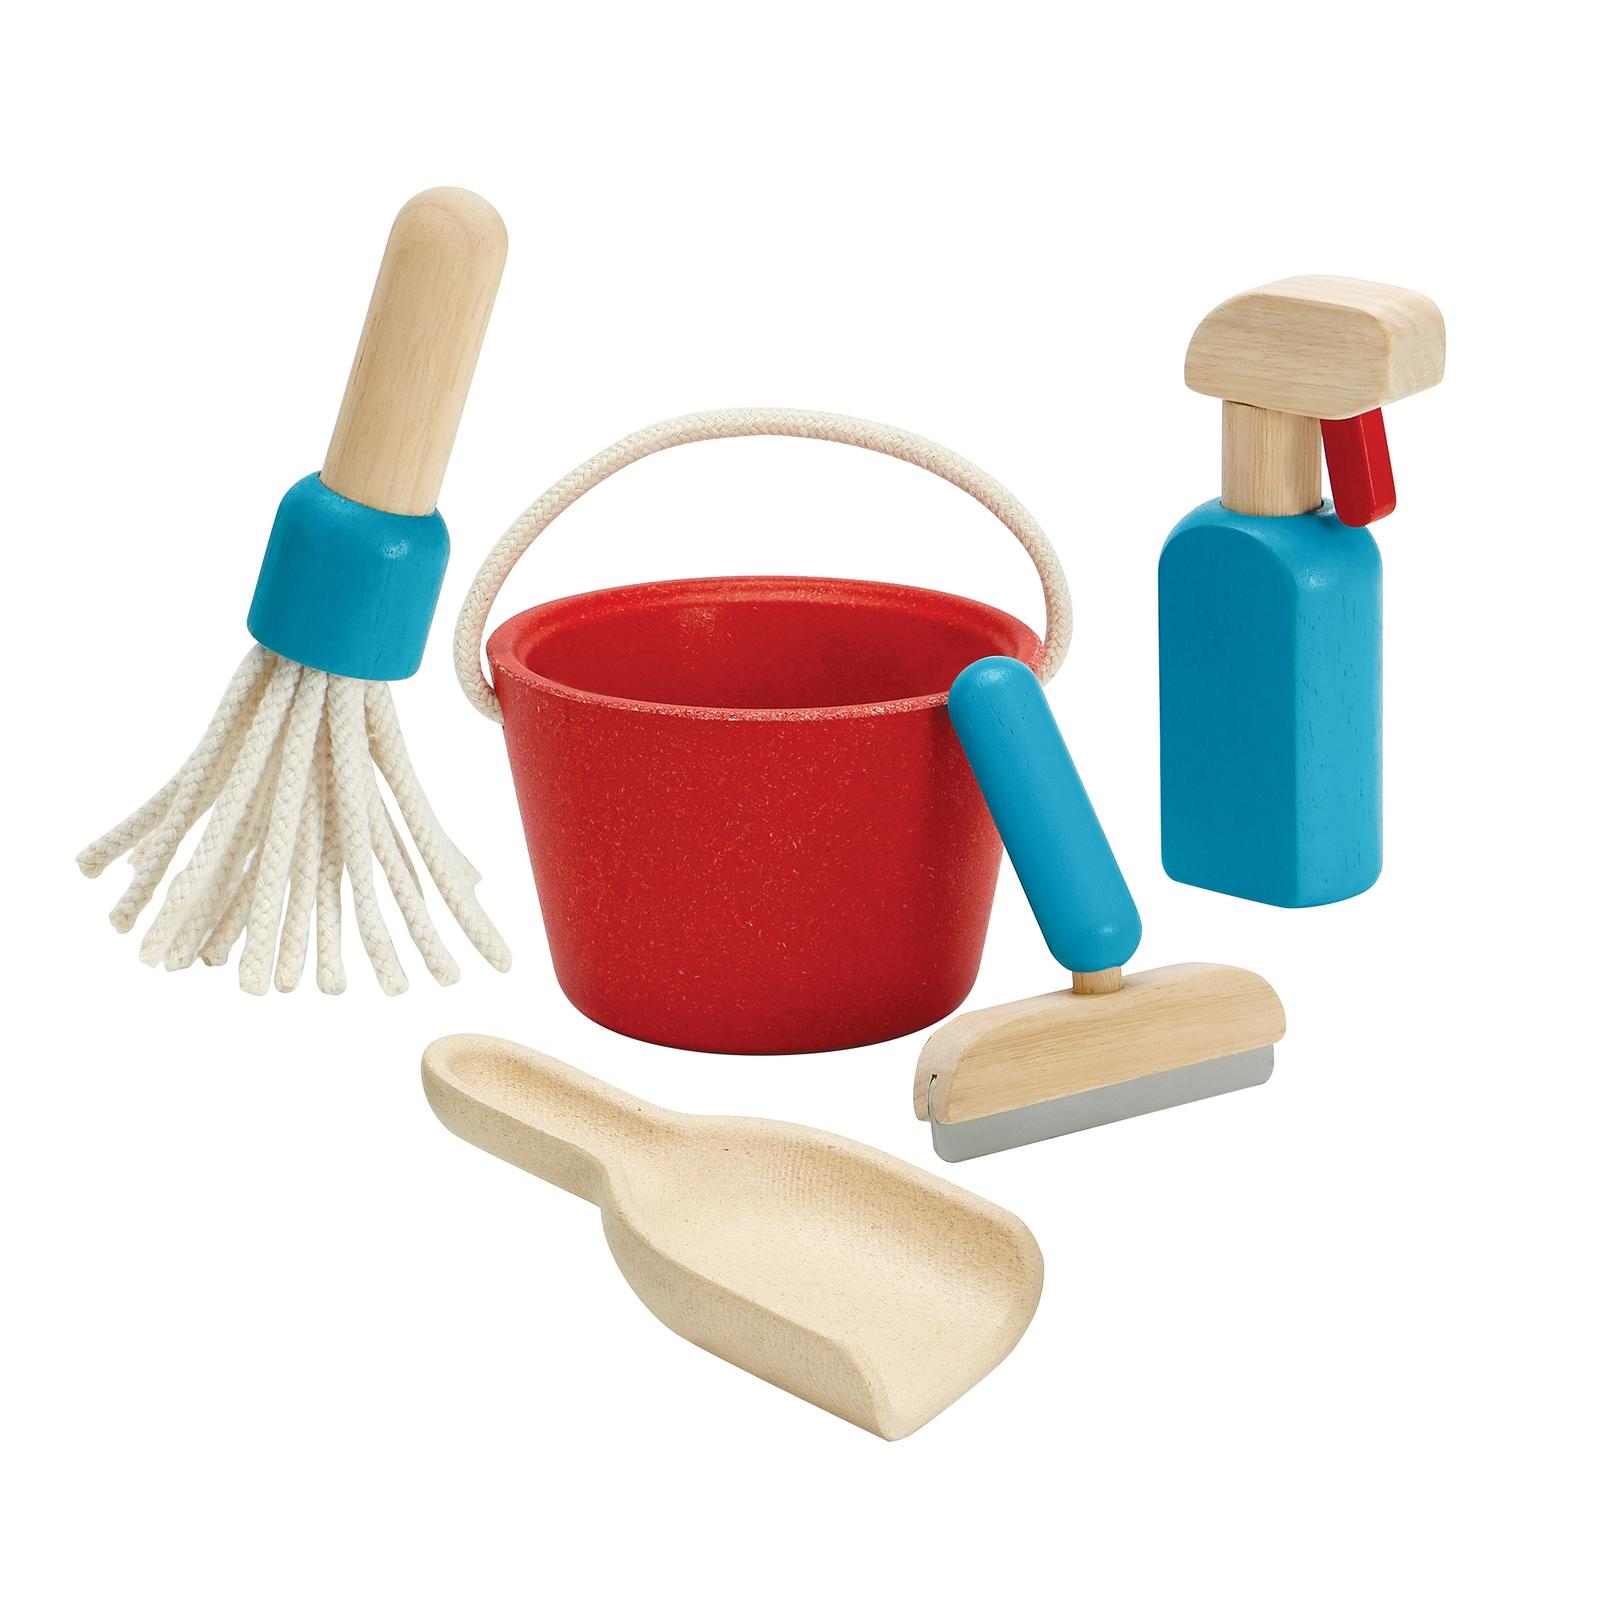 Plan Toys Cleaning Set